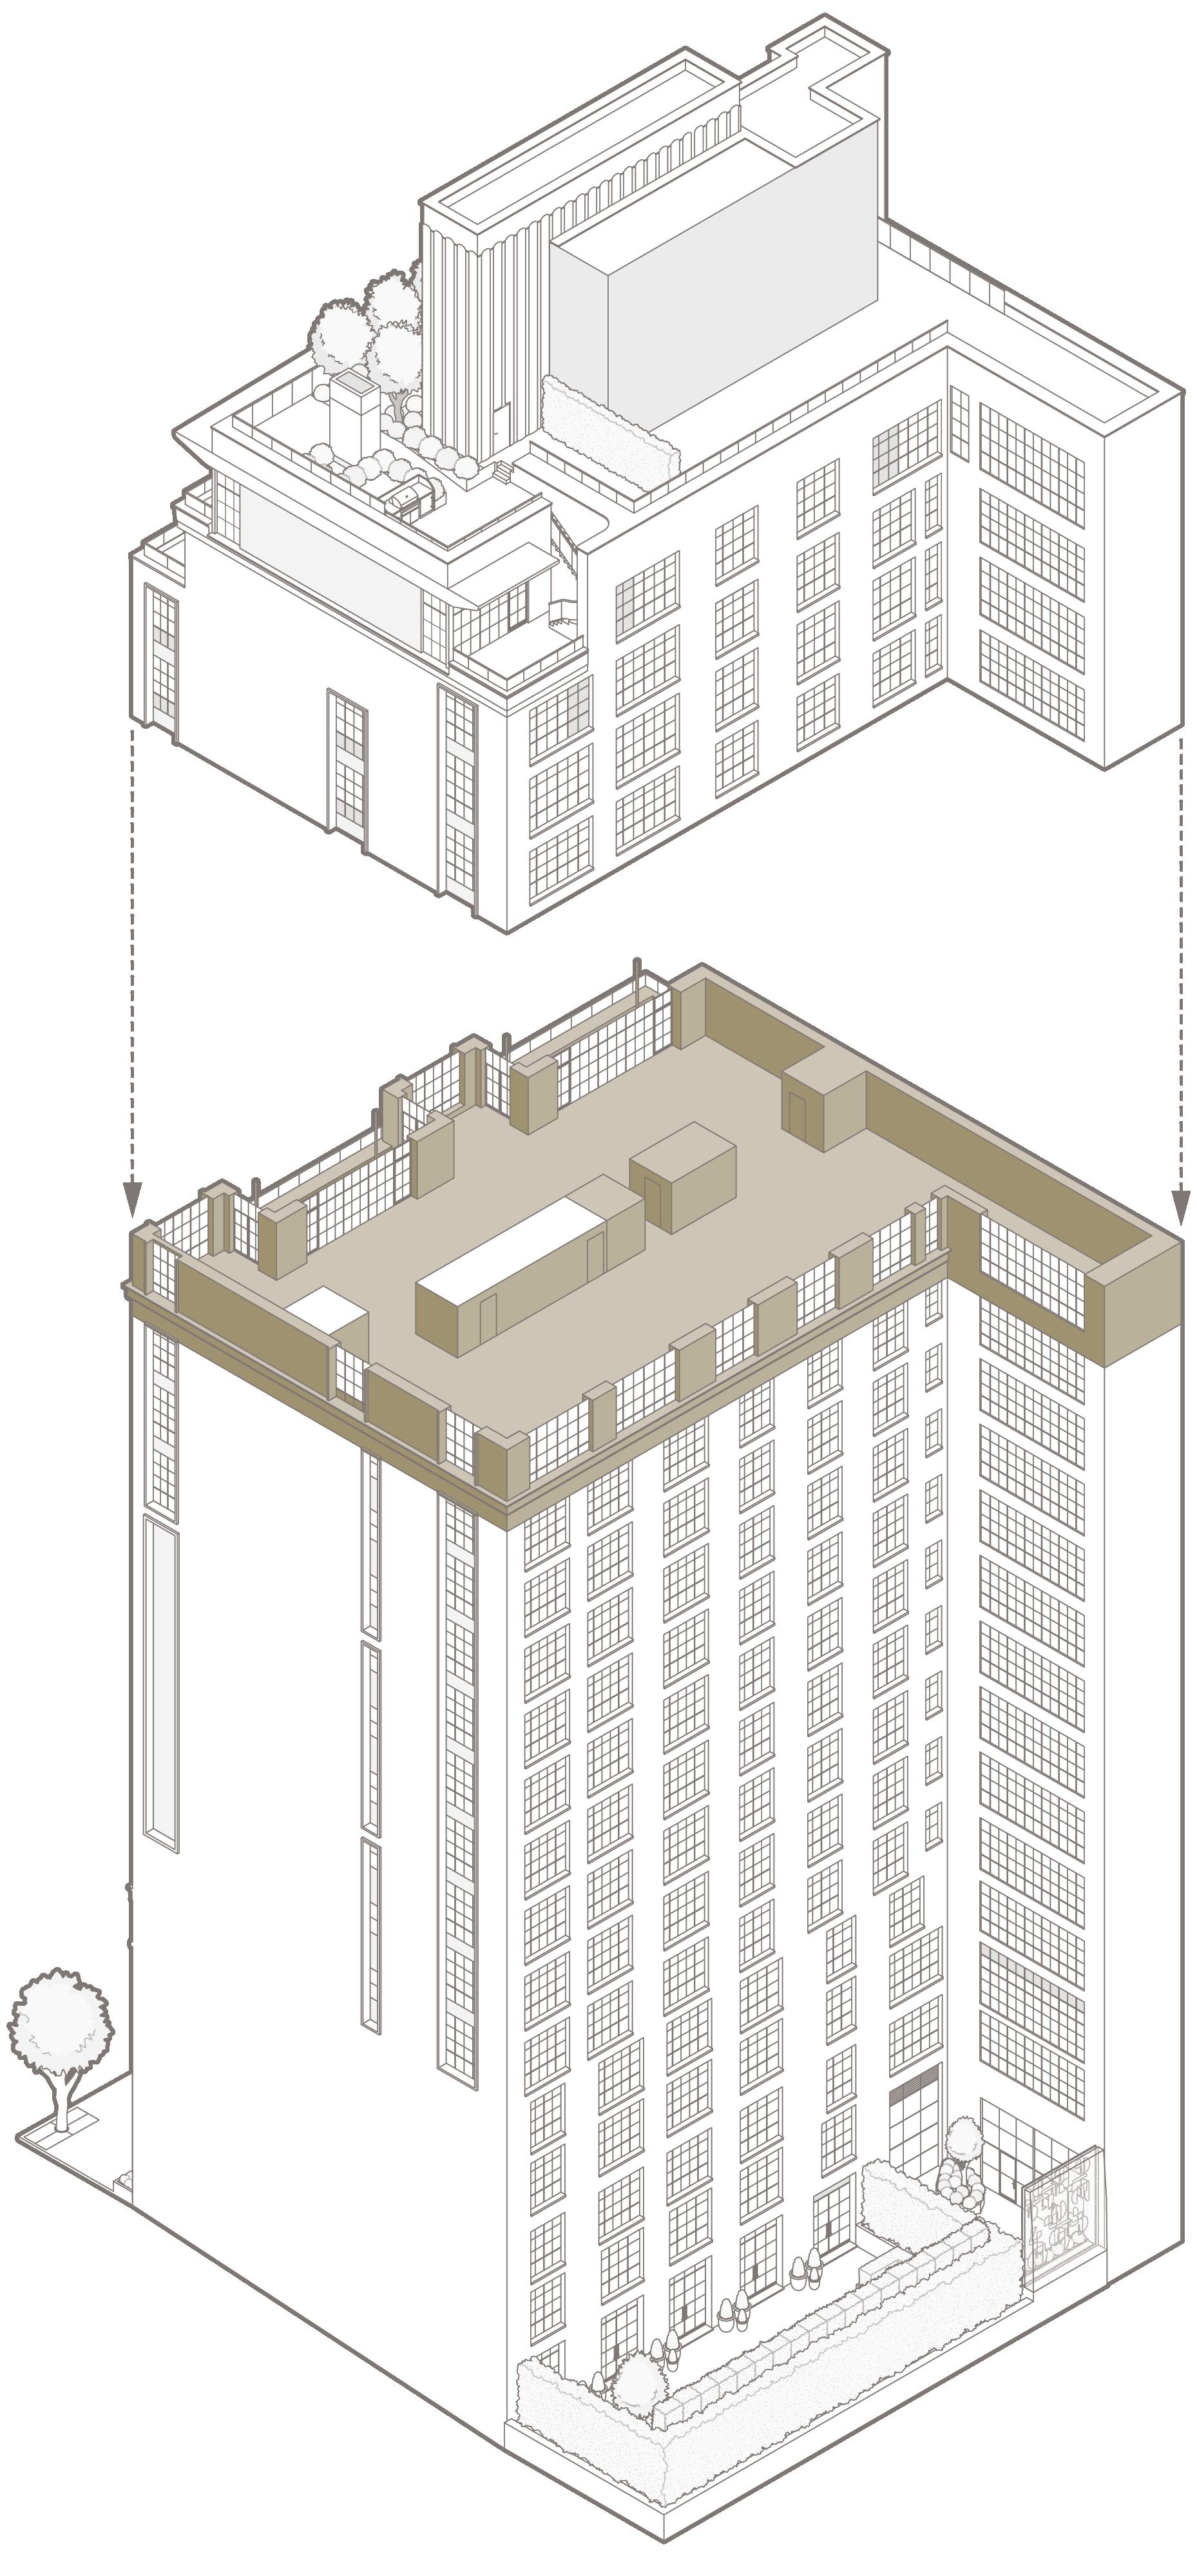 Penthouse 16 – North elevation